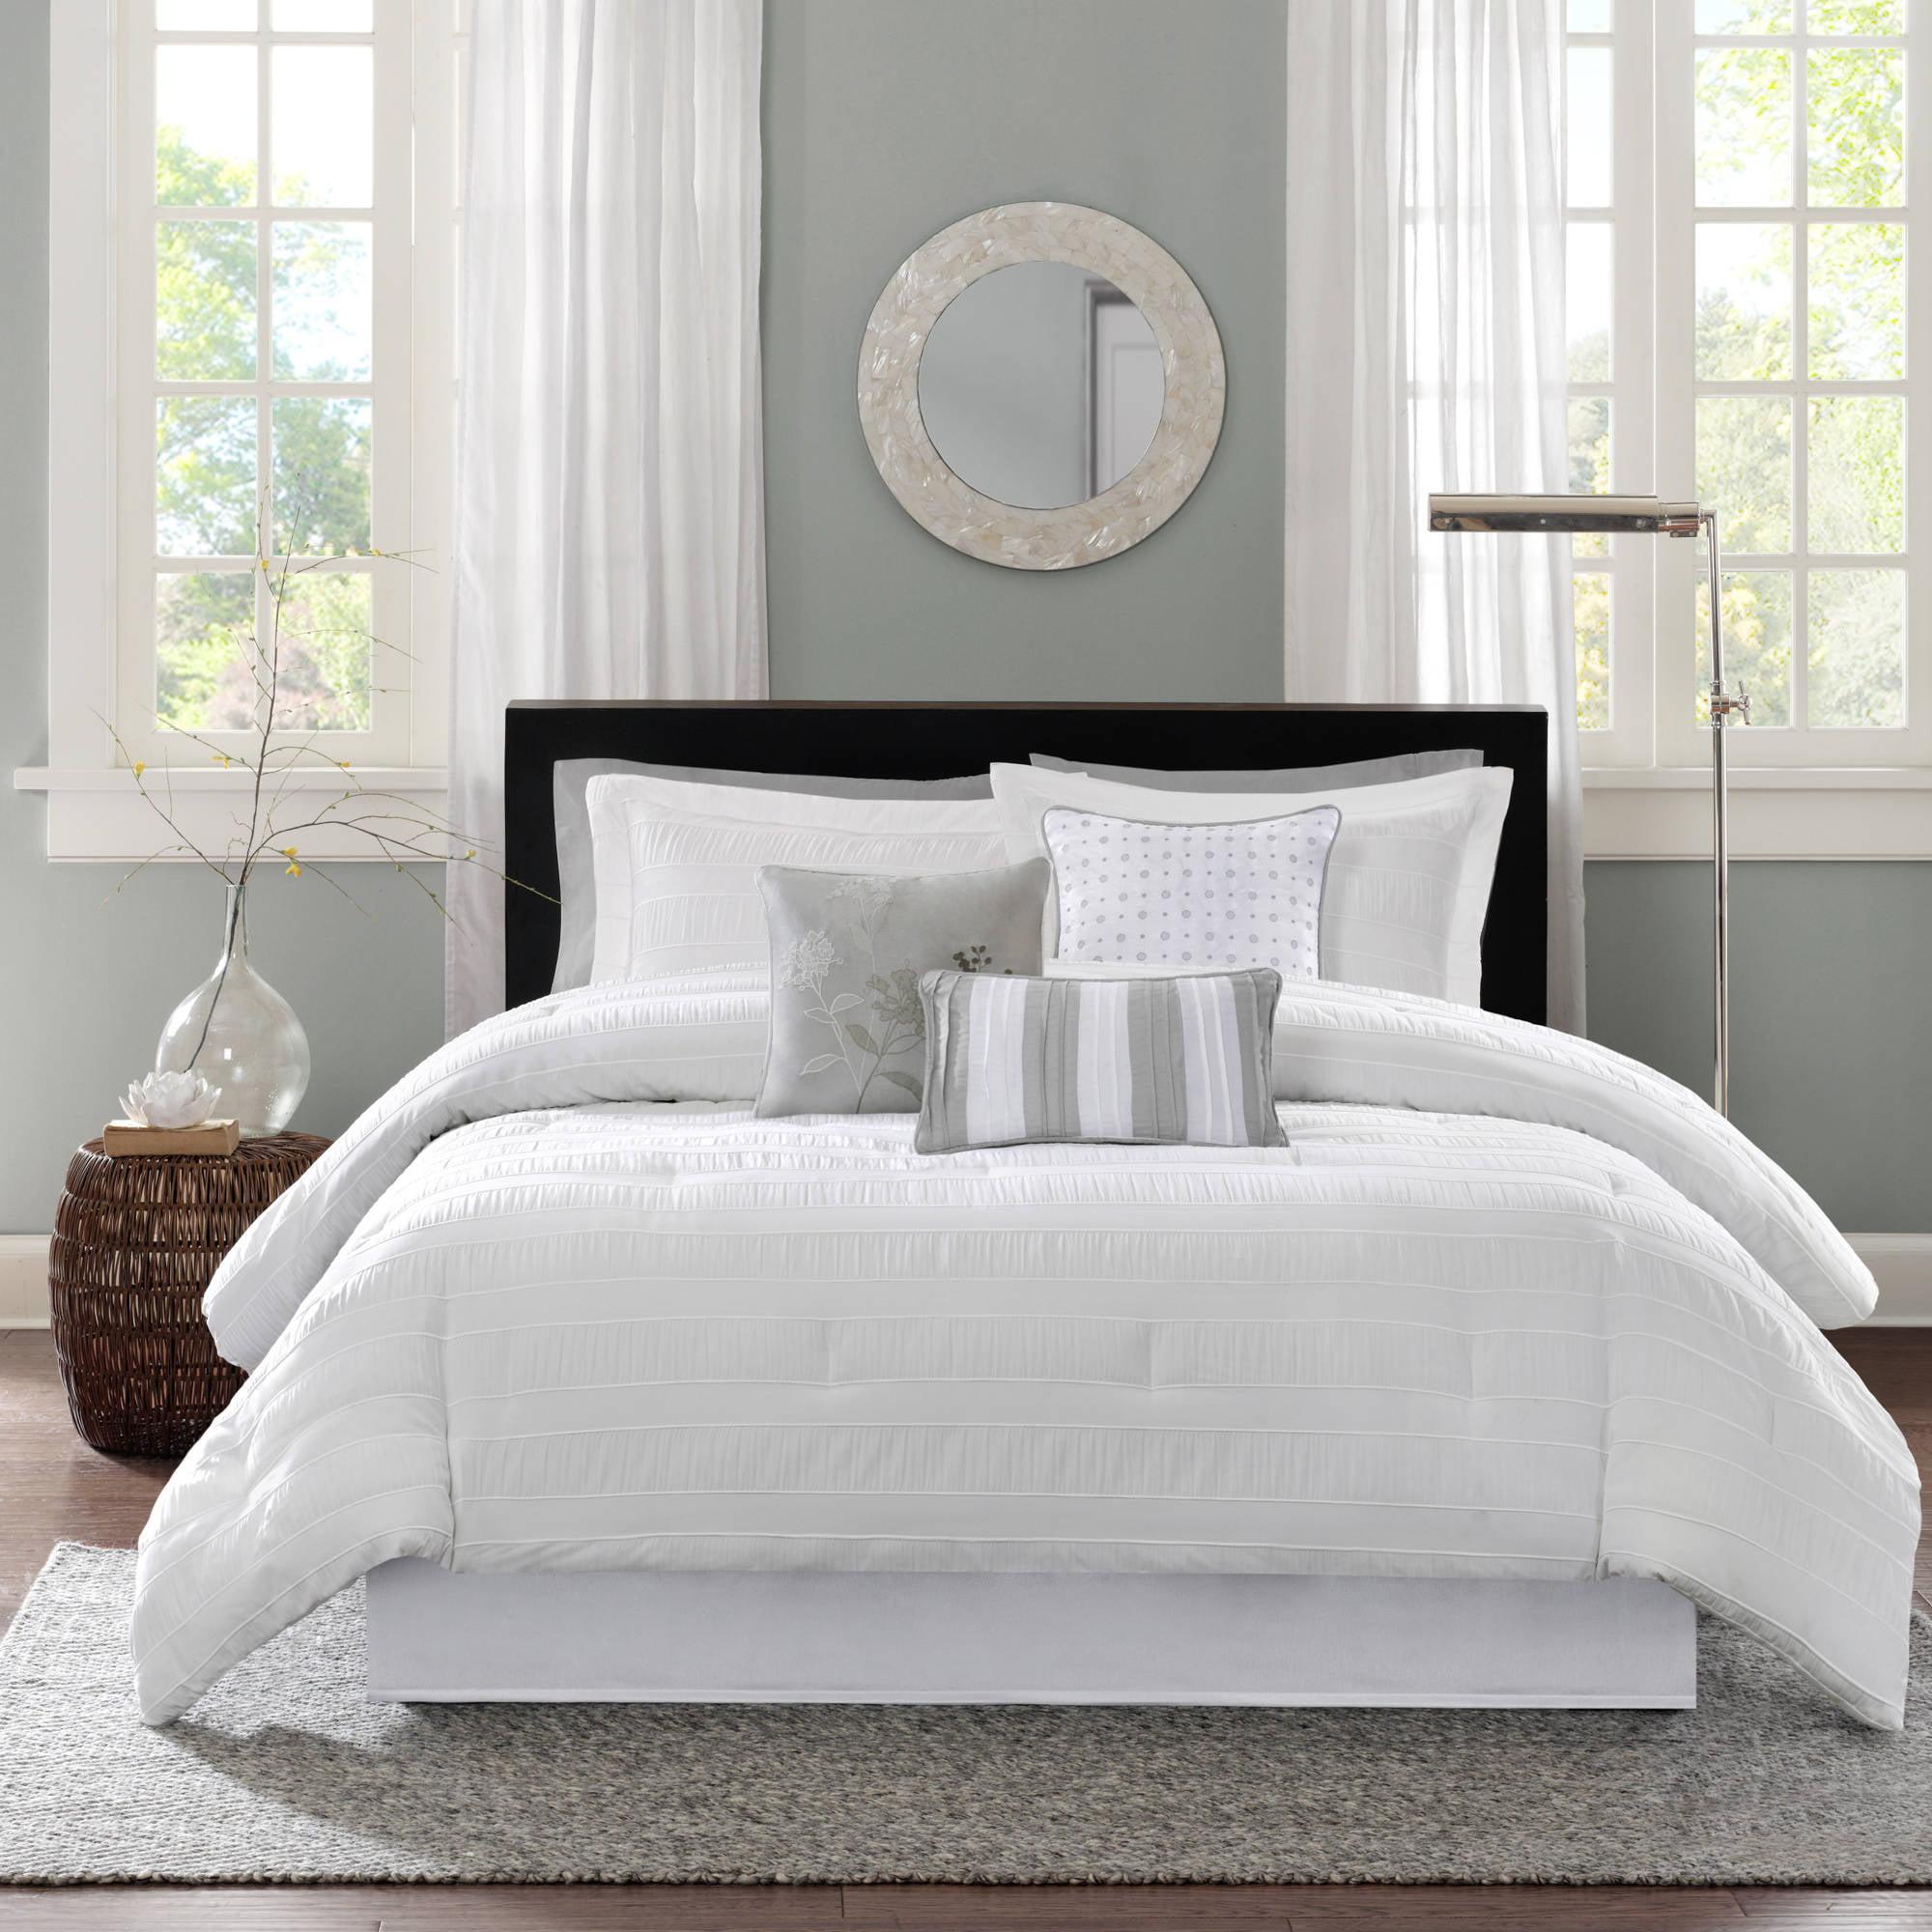 White king bed set - White King Bed Set